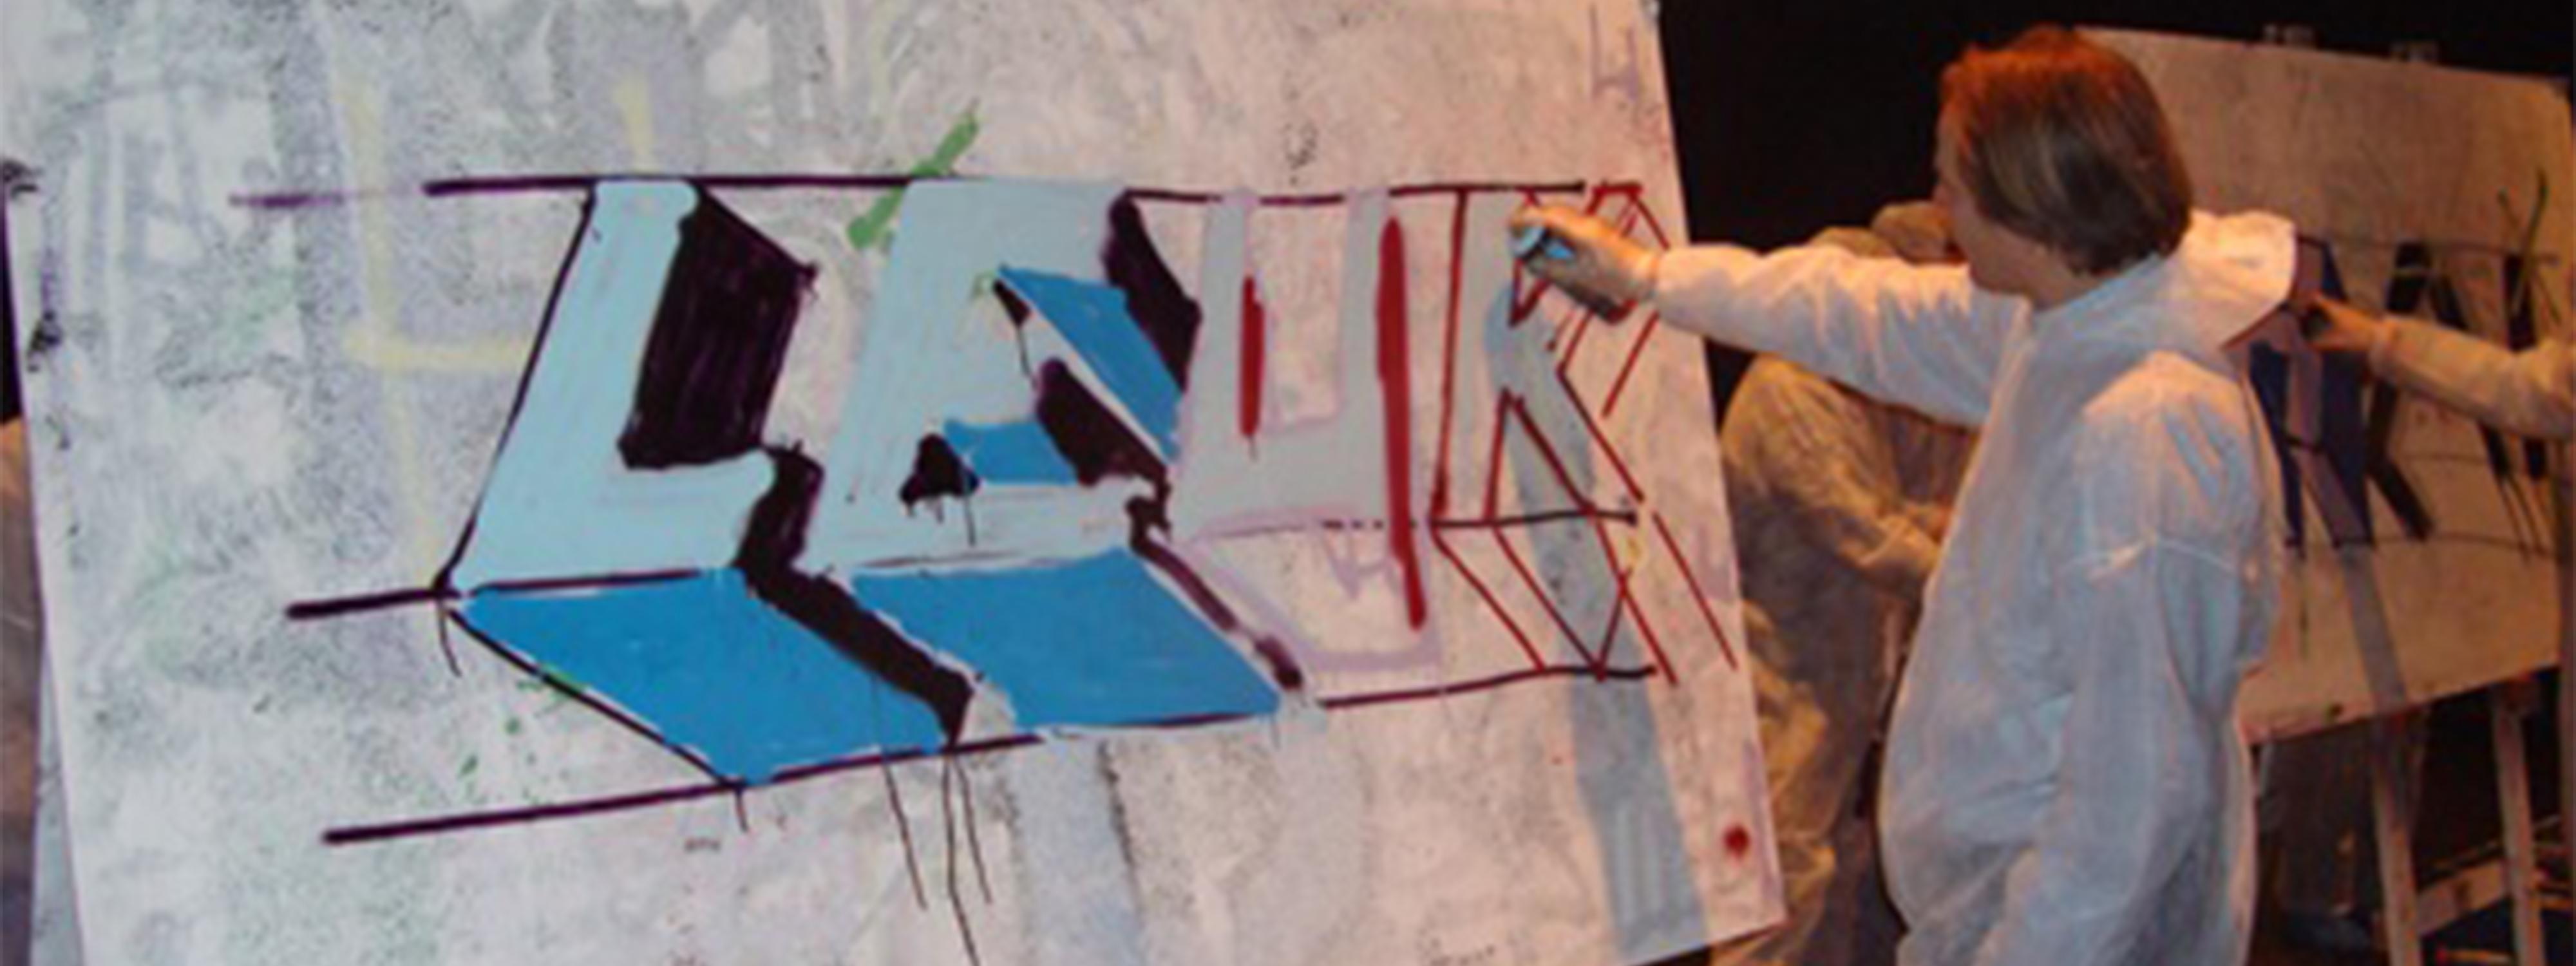 Crazy art tilburg/breda 3